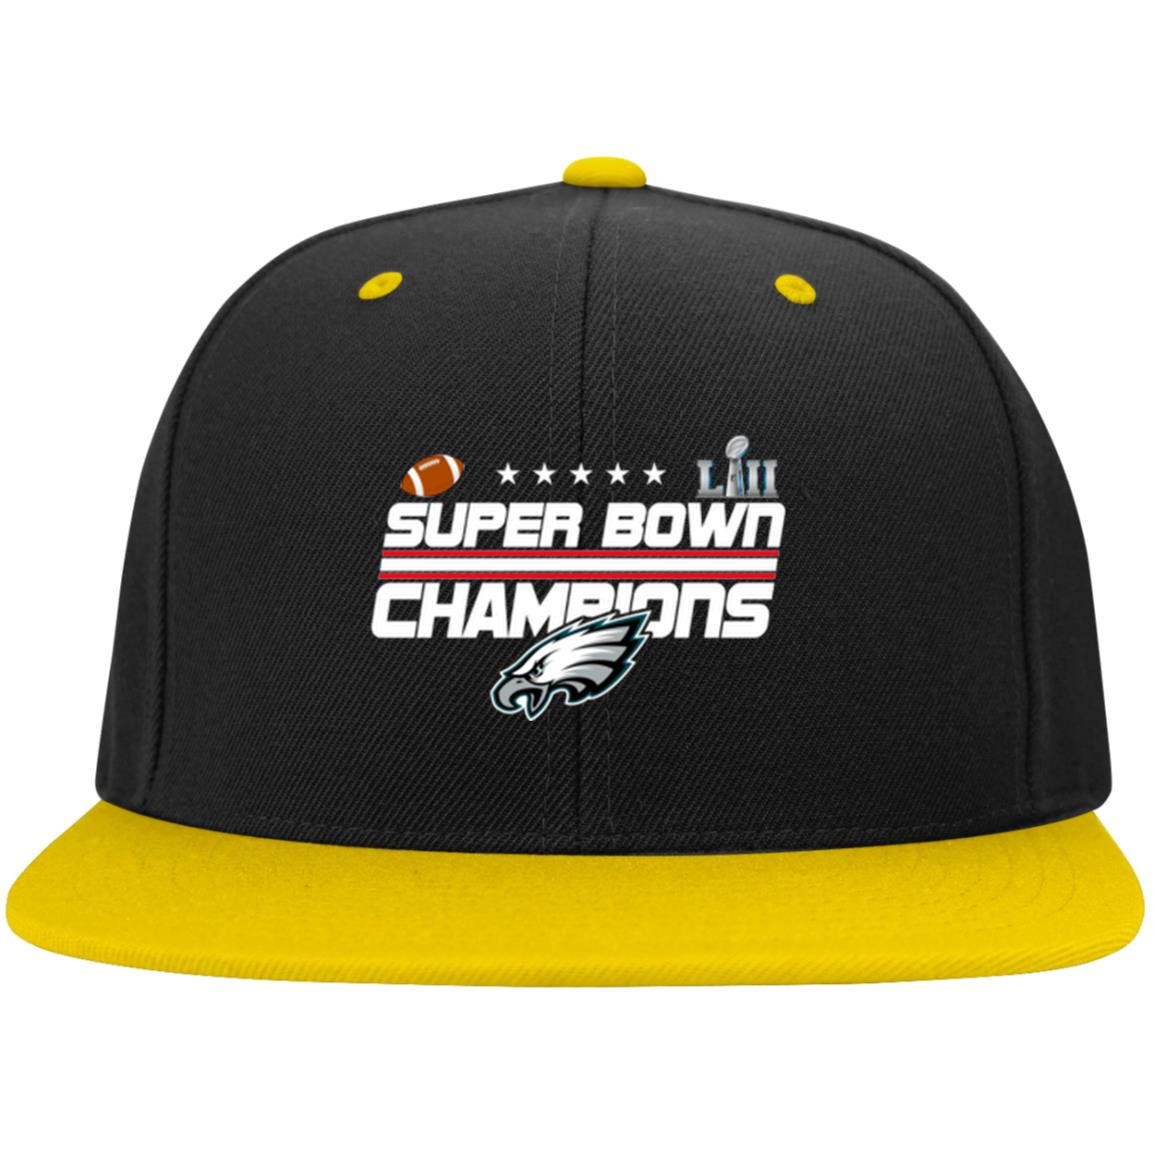 image 261 - Eagles Super Bowl Champions Hats